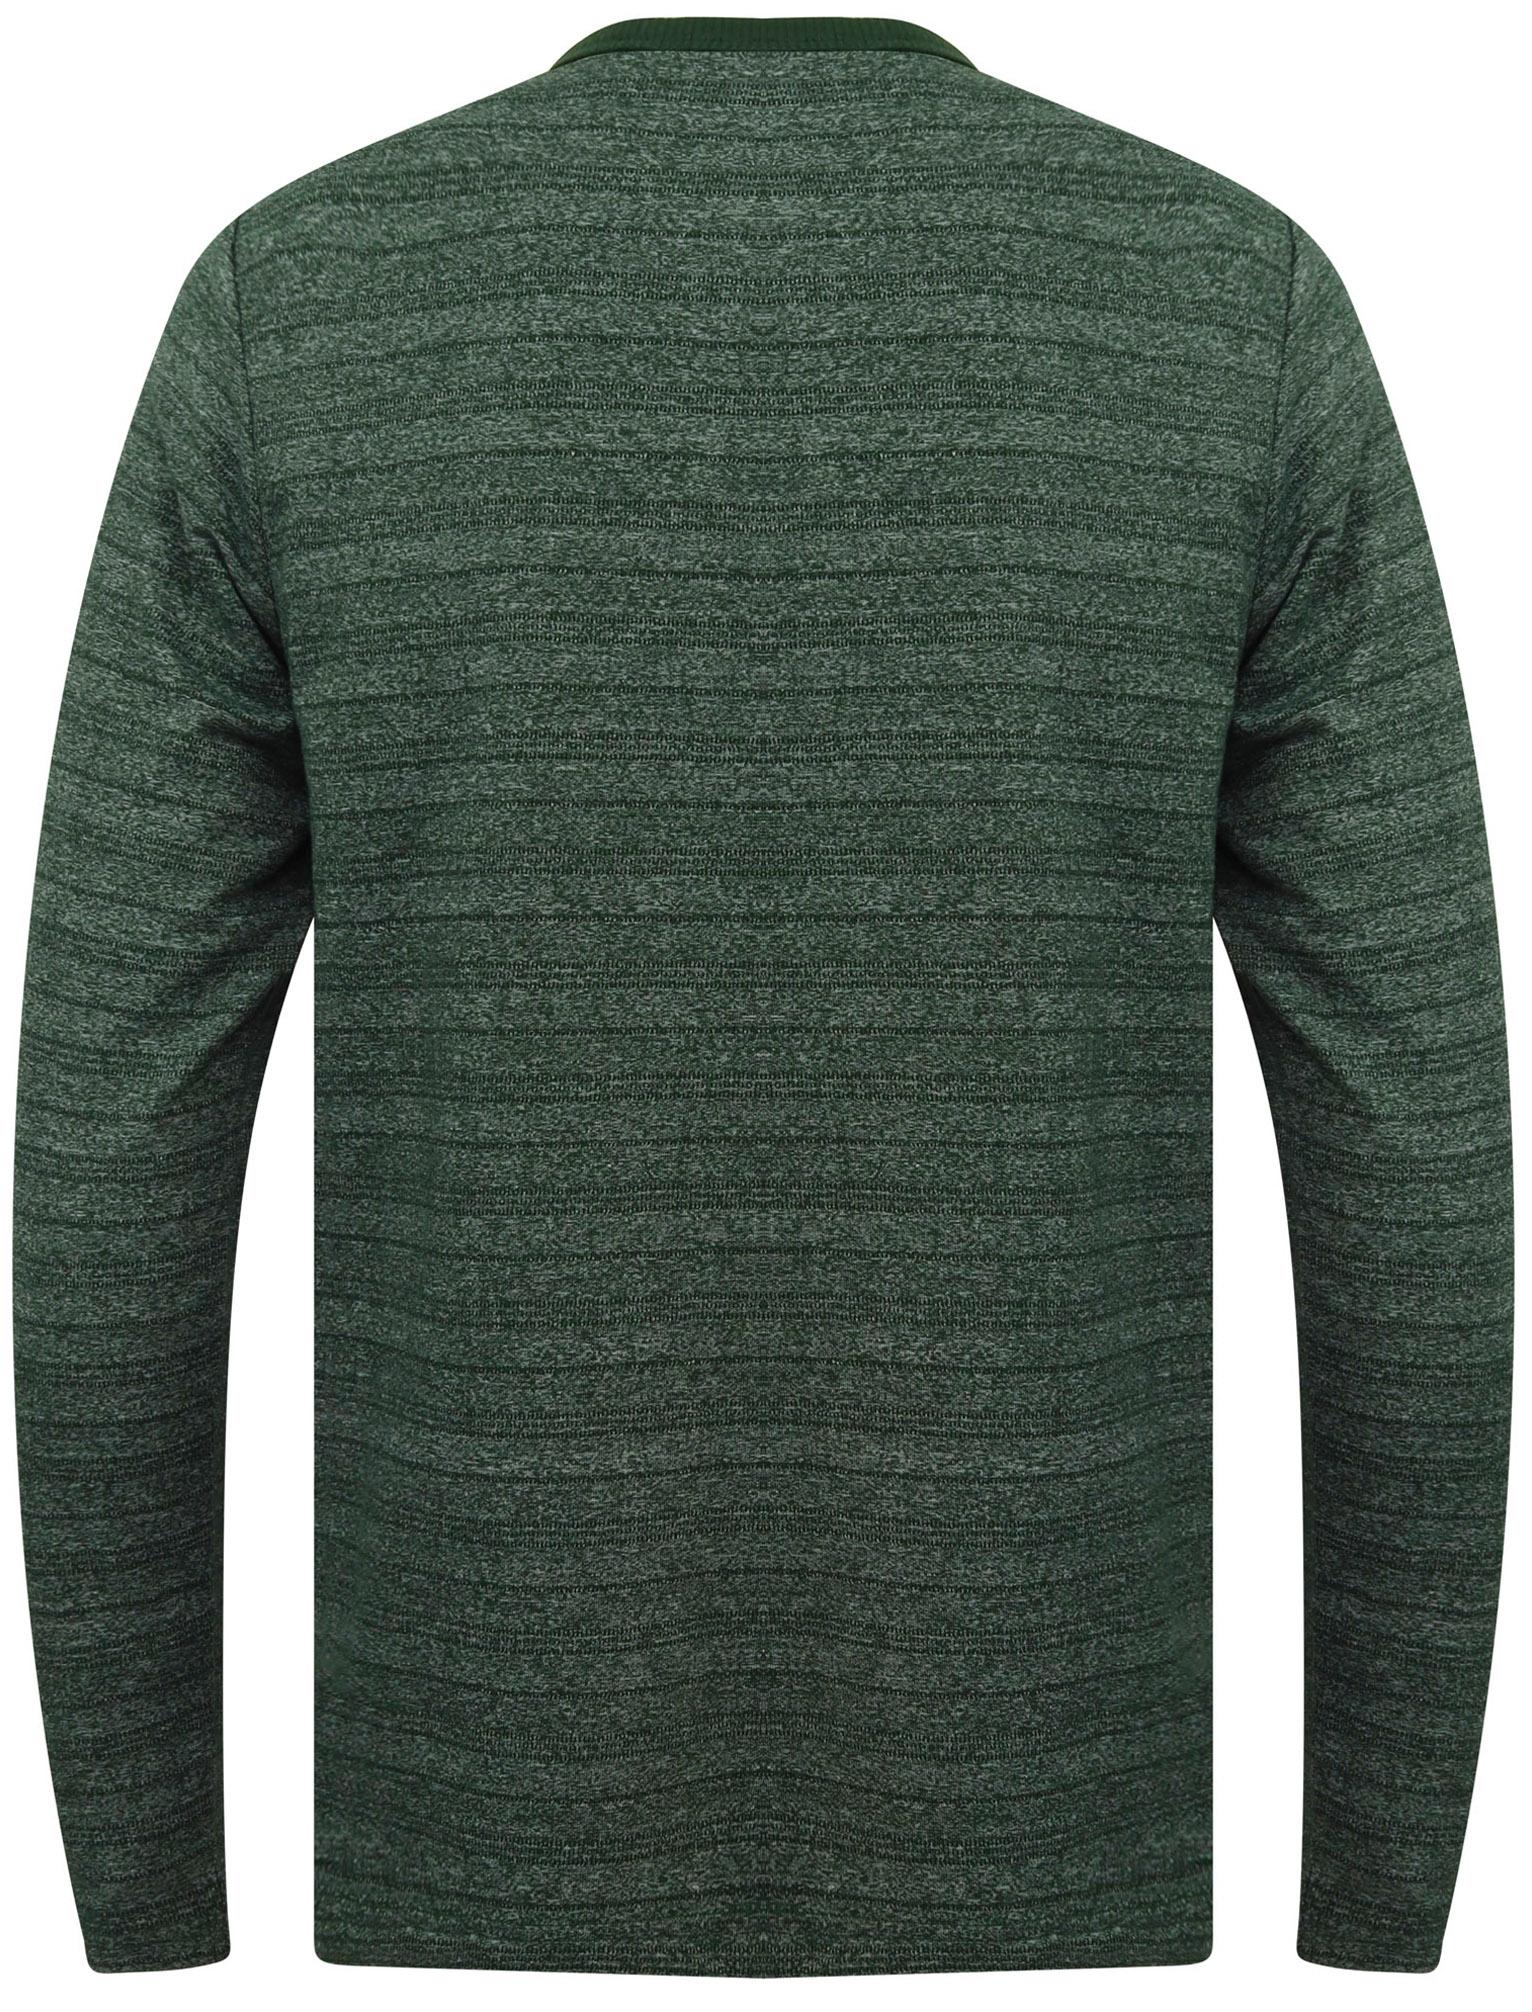 Tokyo-Laundry-Men-Hoaden-Crew-Neck-Long-Sleeve-T-Shirt-Top-Henley-Grandad-Collar thumbnail 13